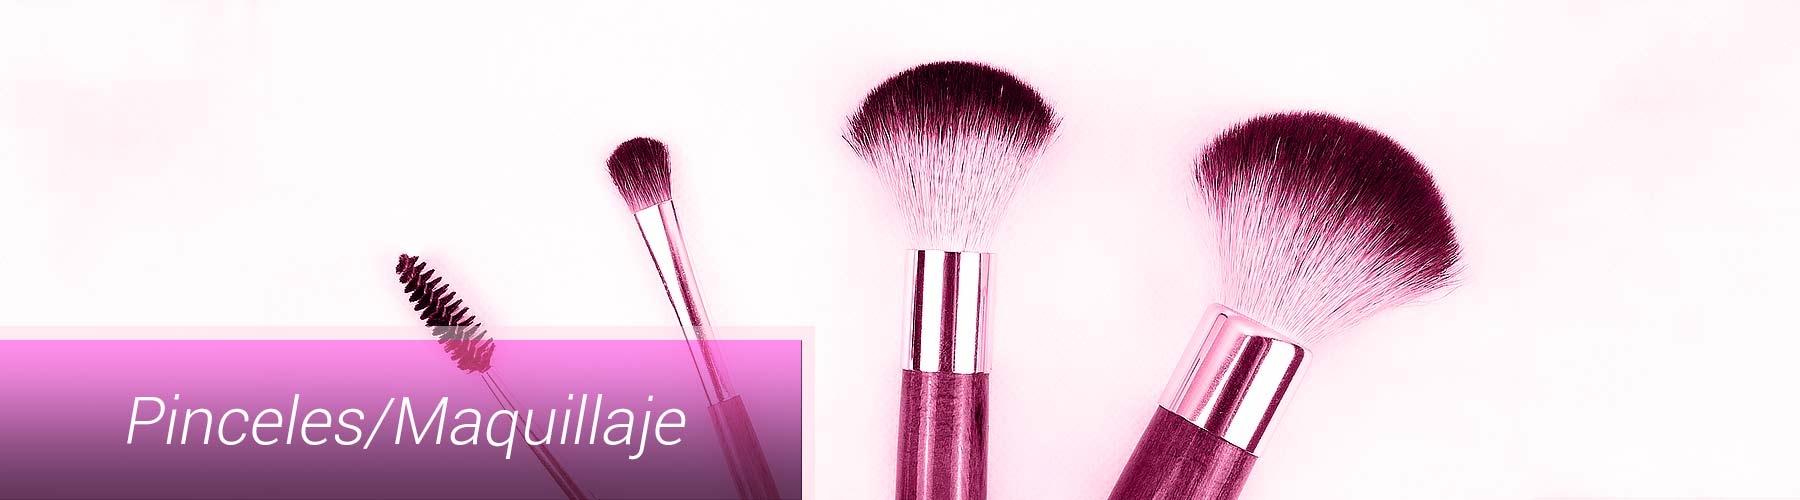 Pinceles / Maquillaje